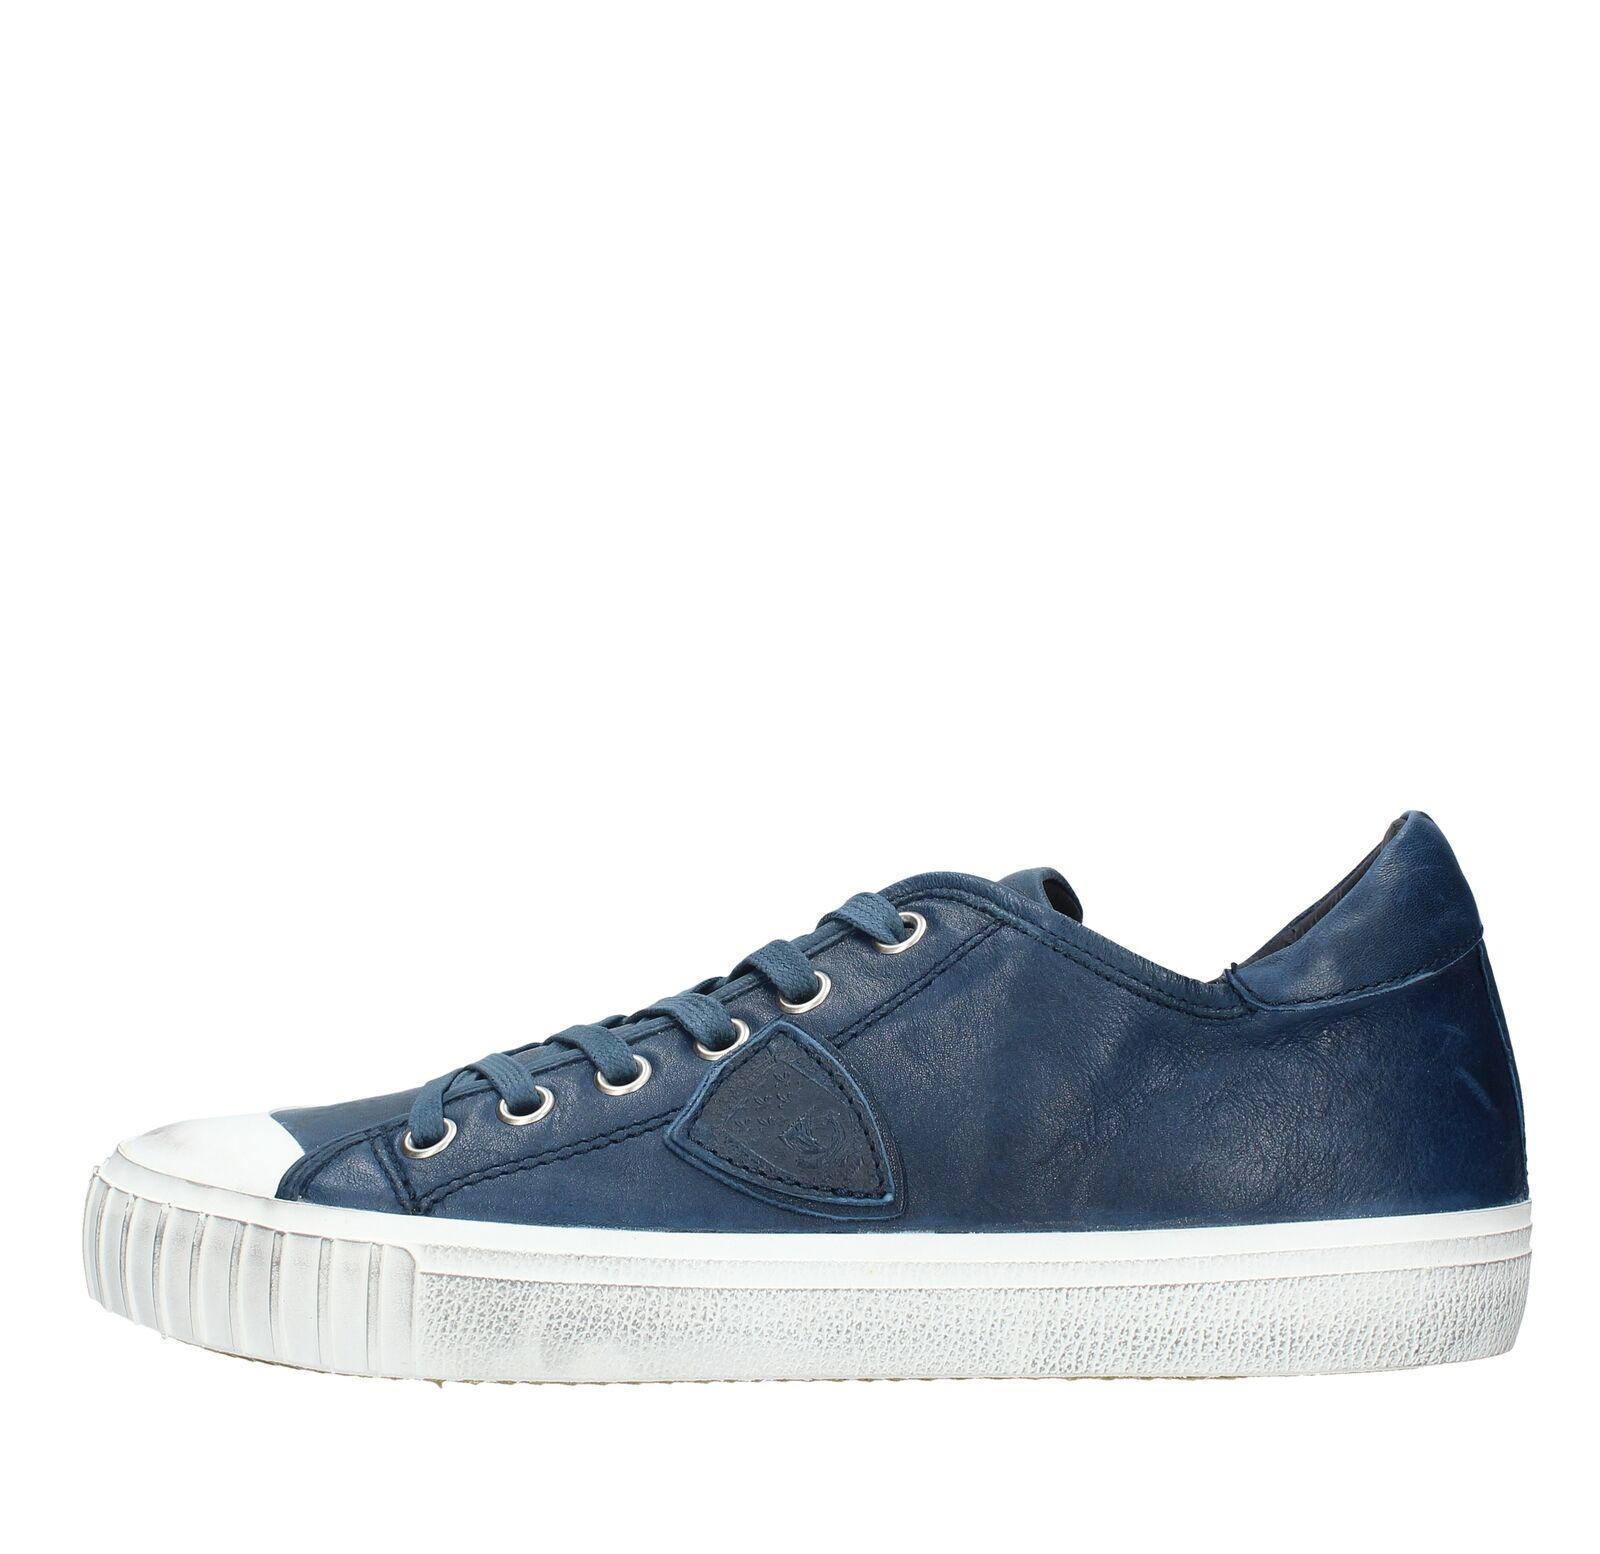 AMF119_PMOD Scarpe scarpe da ginnastica PHILIPPE MODEL uomo Blu